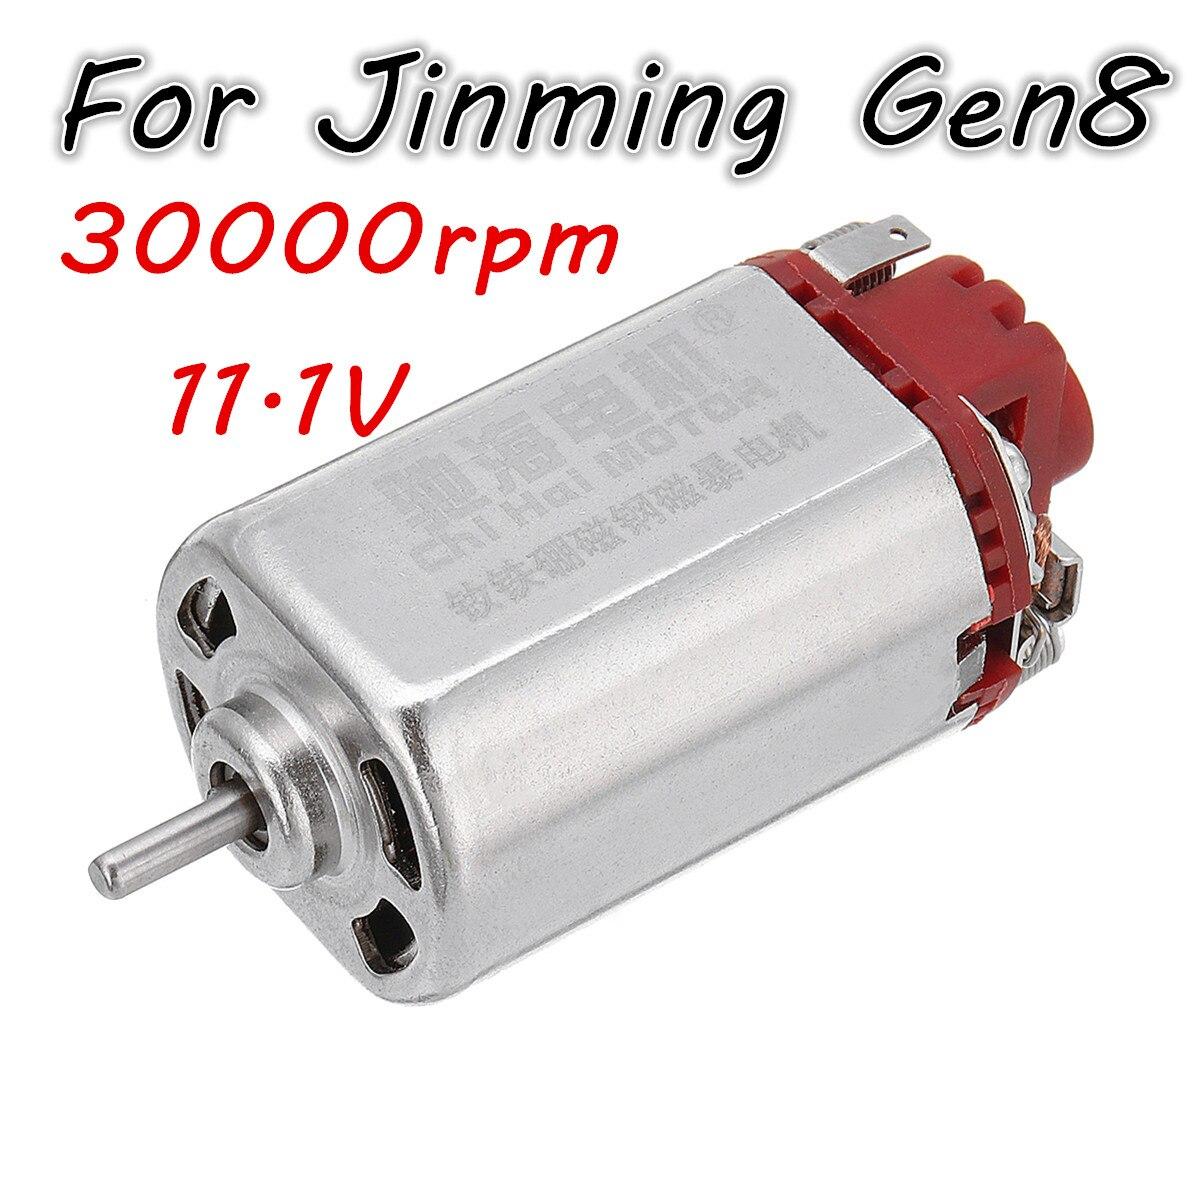 11.1V 31000rpm Gear Motor Nd Fe B Motor Gel Ball Blasters Guns Toy 460 Upgrade Motor for Jinming 8th Gen M4A1